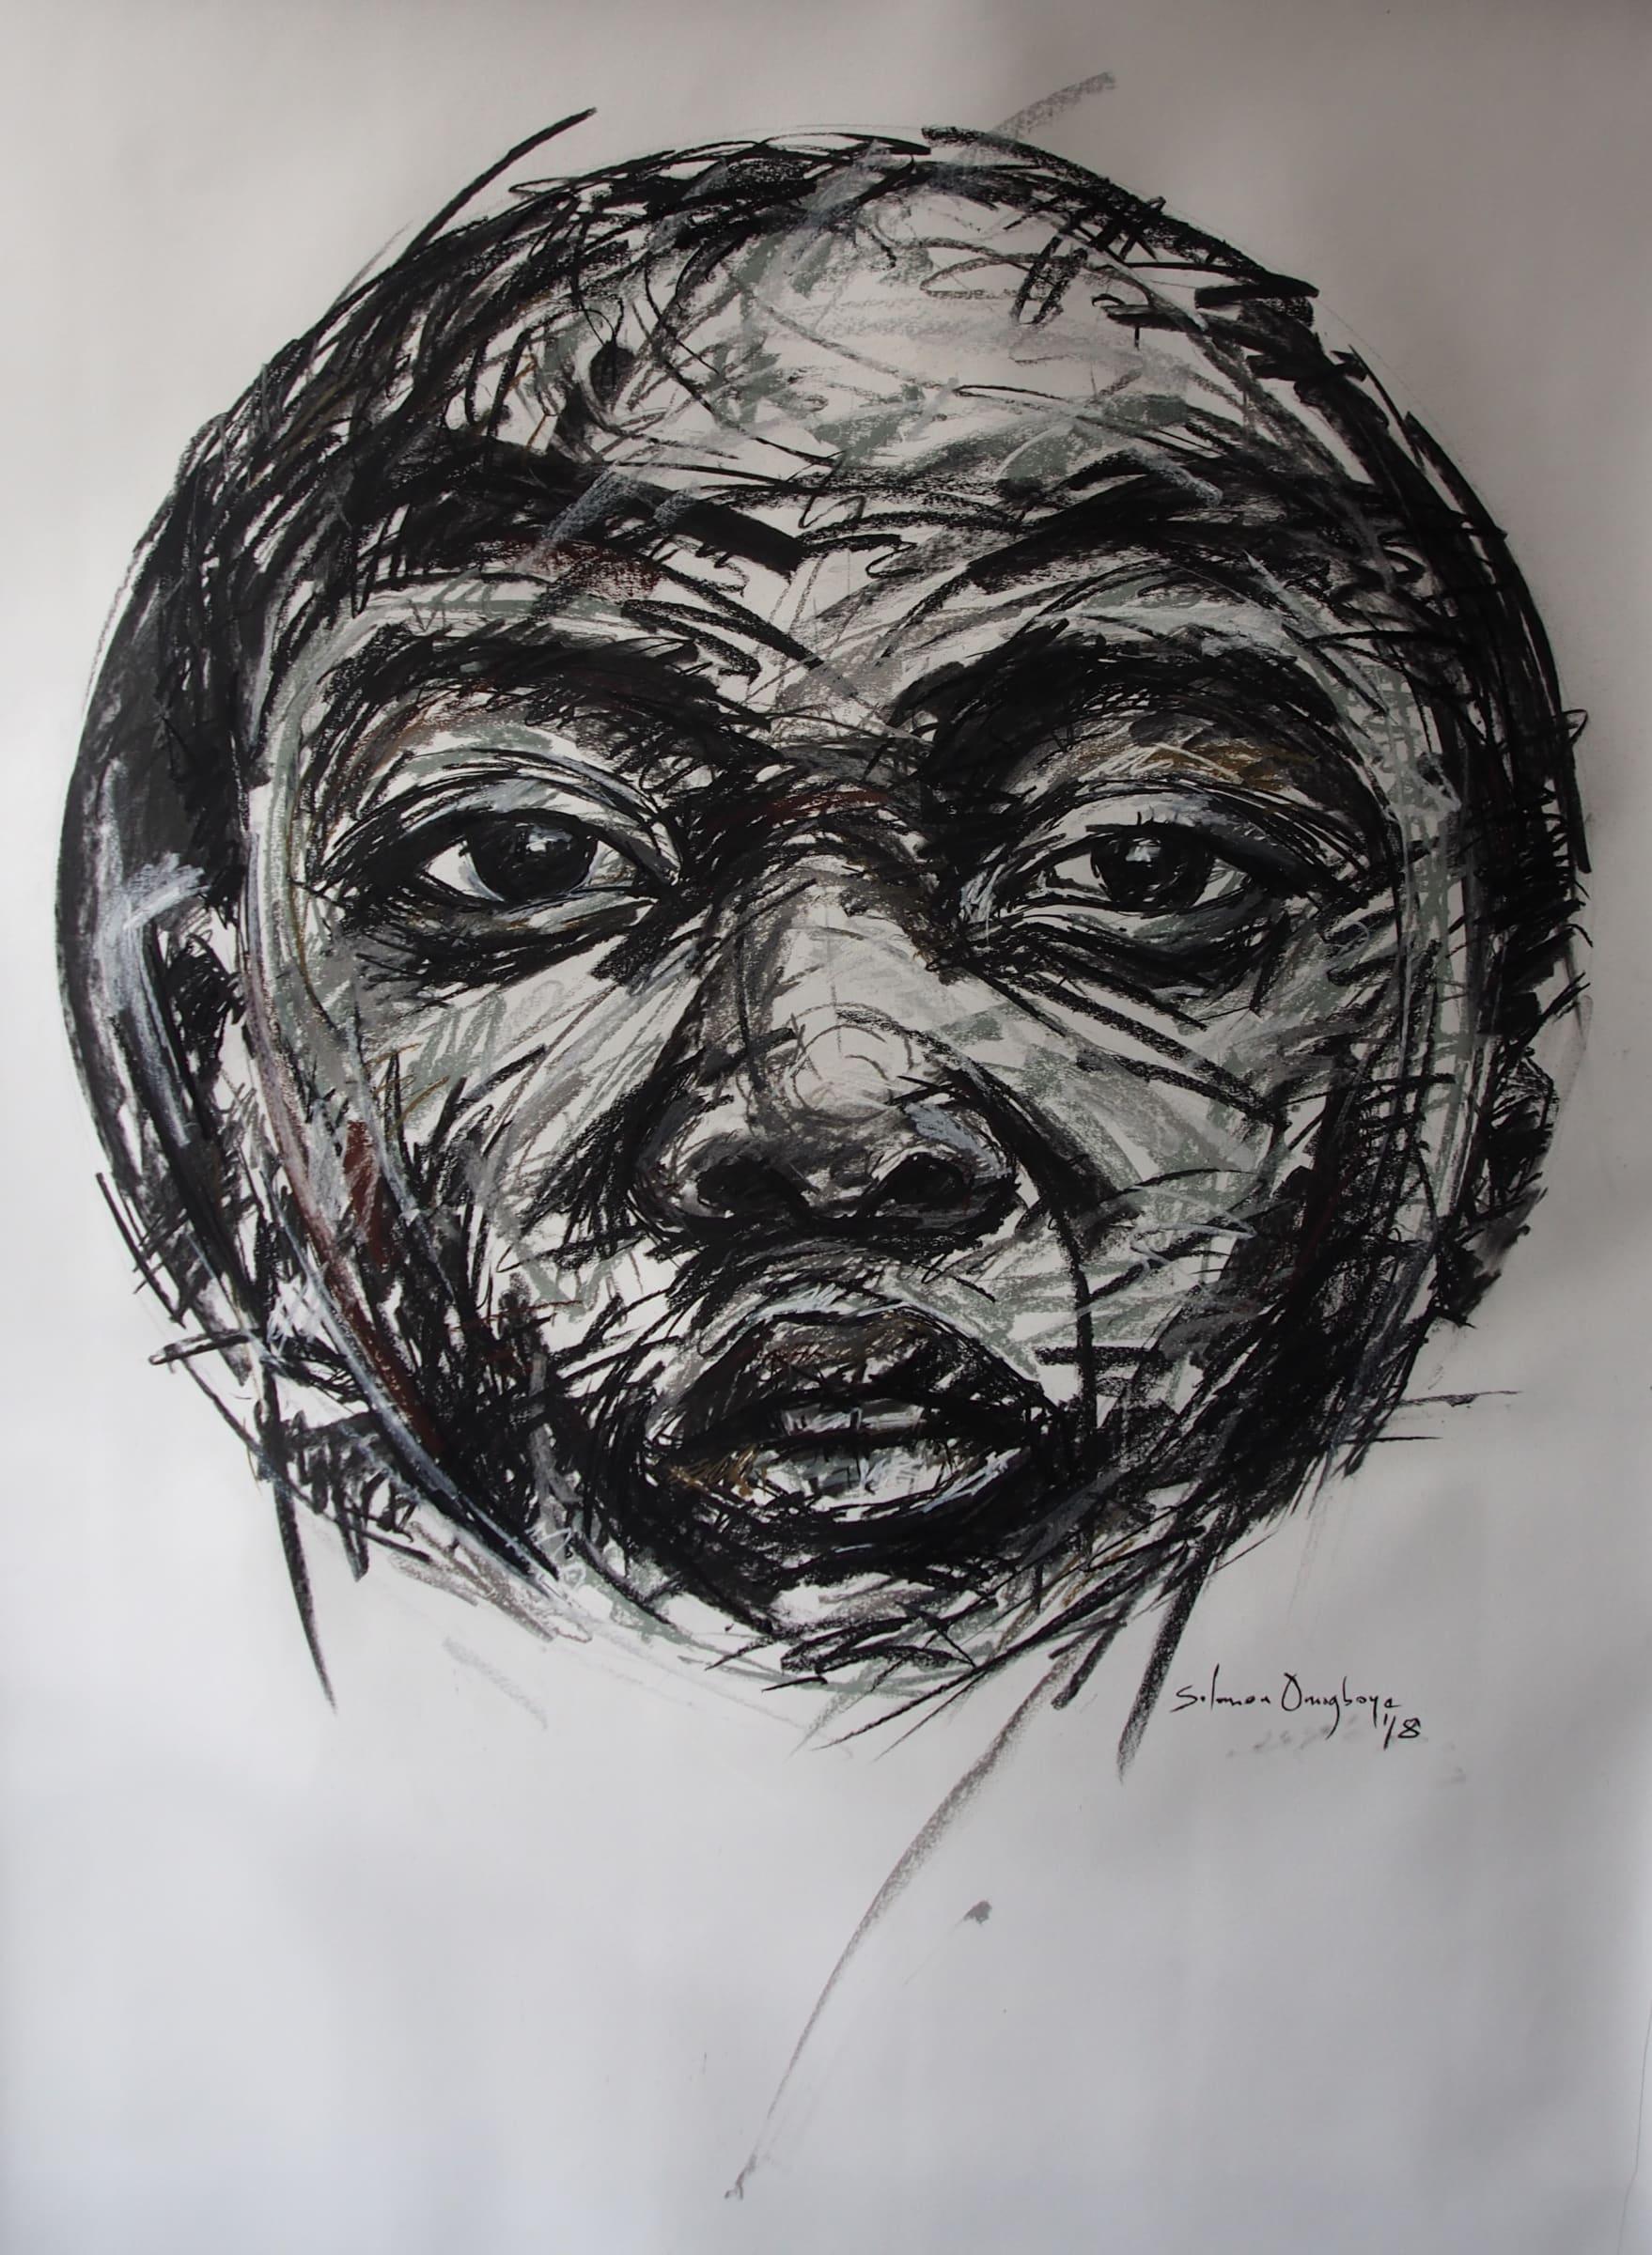 <span class=&#34;link fancybox-details-link&#34;><a href=&#34;/artists/39-solomon-omogboye/works/2004-solomon-omogboye-behold-innocence-2018/&#34;>View Detail Page</a></span><div class=&#34;artist&#34;><strong>Solomon Omogboye</strong></div> <div class=&#34;title&#34;><em>Behold Innocence</em>, 2018</div> <div class=&#34;medium&#34;>Drawing On Paper</div> <div class=&#34;dimensions&#34;>99cm x 129cm (118.7cm x 148.7cm framed)</div><div class=&#34;price&#34;>R18,850.00</div>